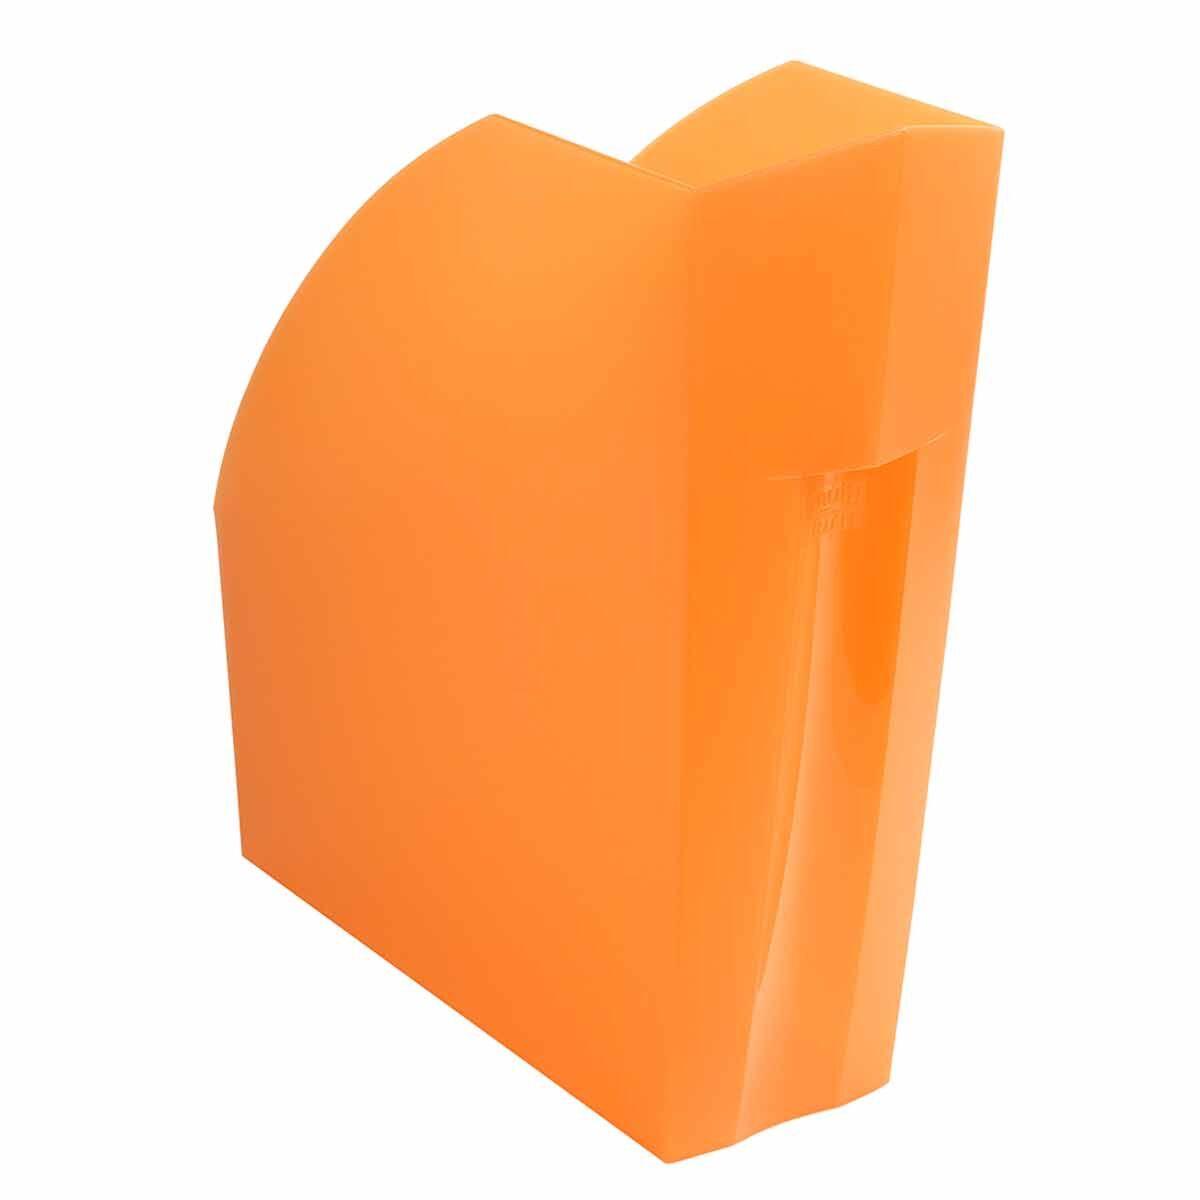 Exacompta Linicolor Magazine File Pack of 3 Orange